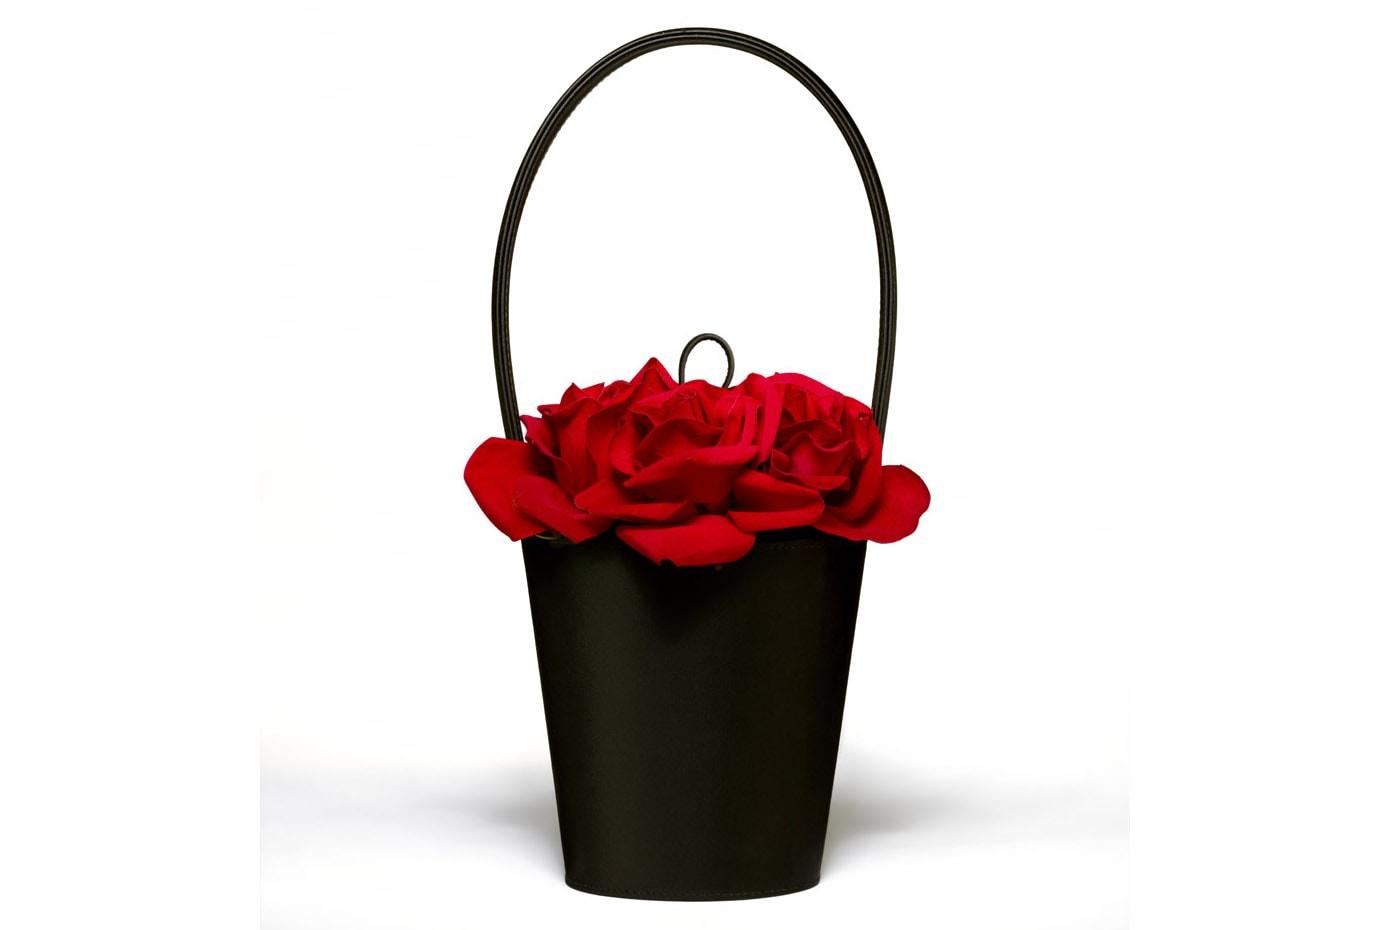 Lulu-Guiness-Florist's-Basket-handbag-1996-UK-c-Victoria-and-Albert-Museum-London